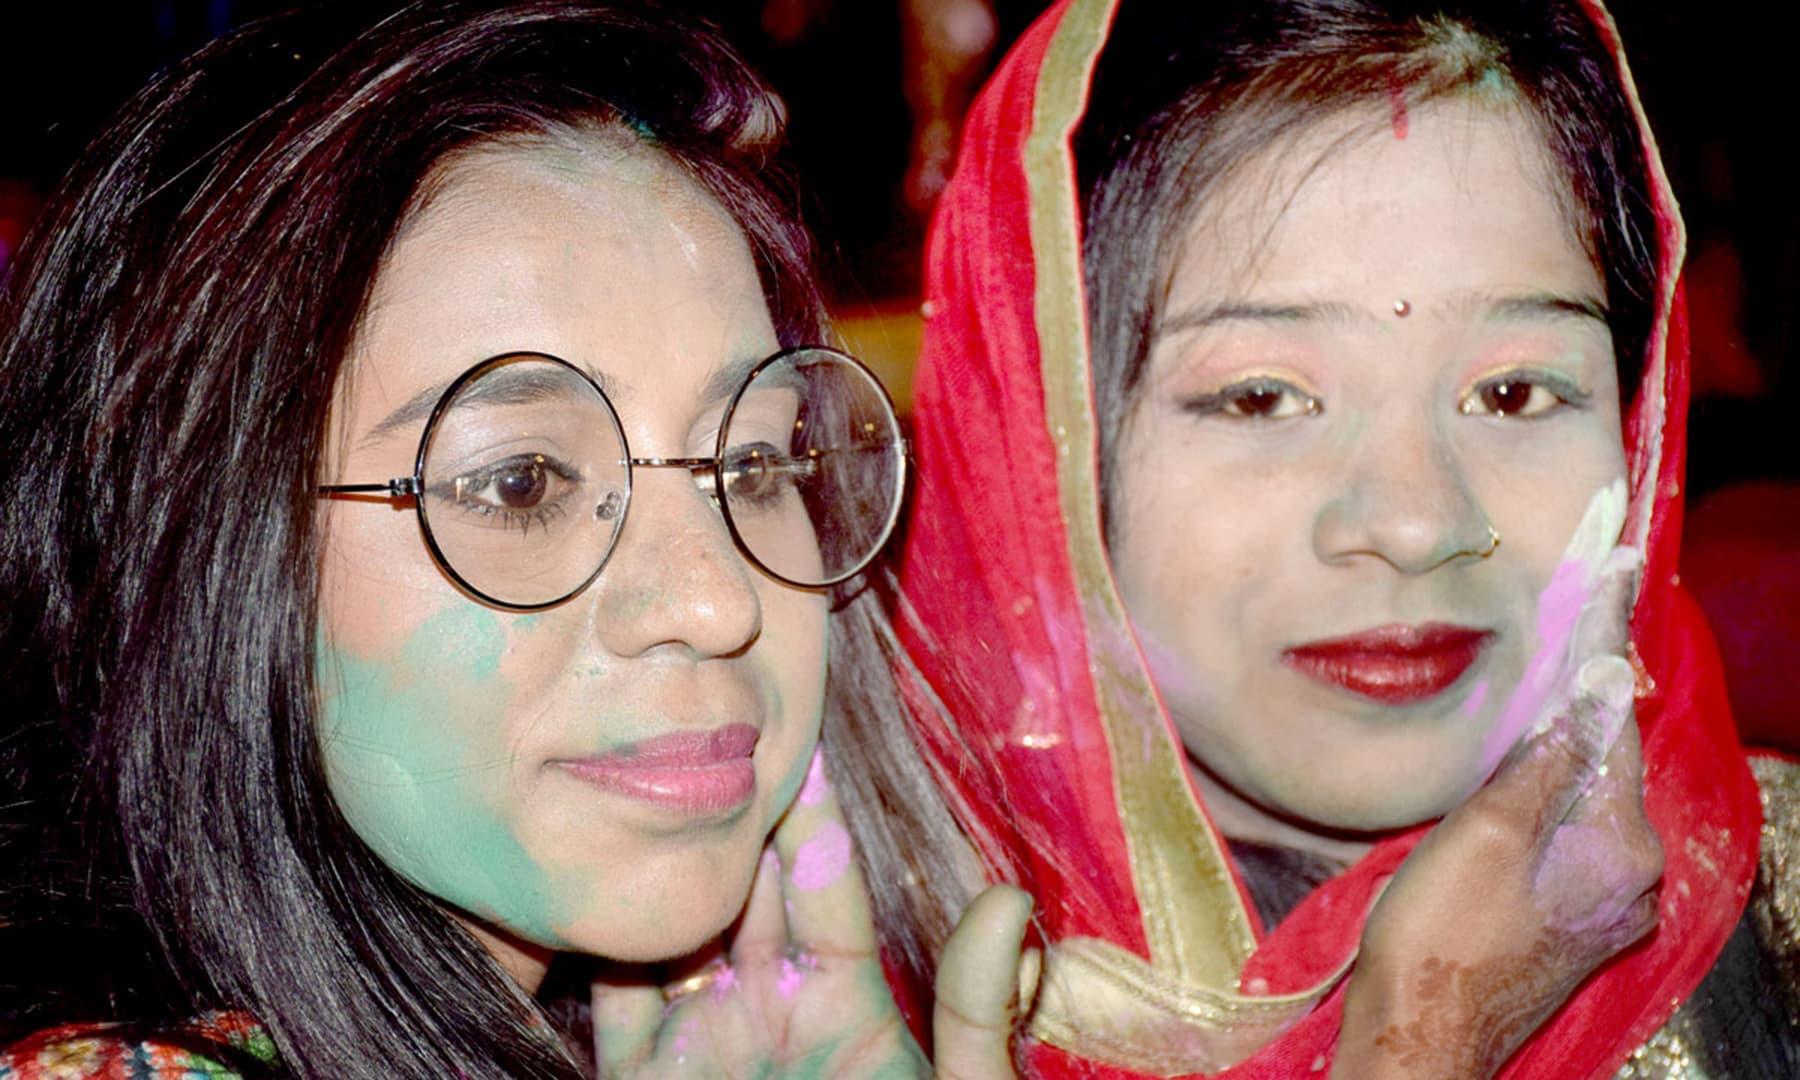 Members of the Hindu community celebrate Holi at a venue in Hyderabad, Pakistan. — APP